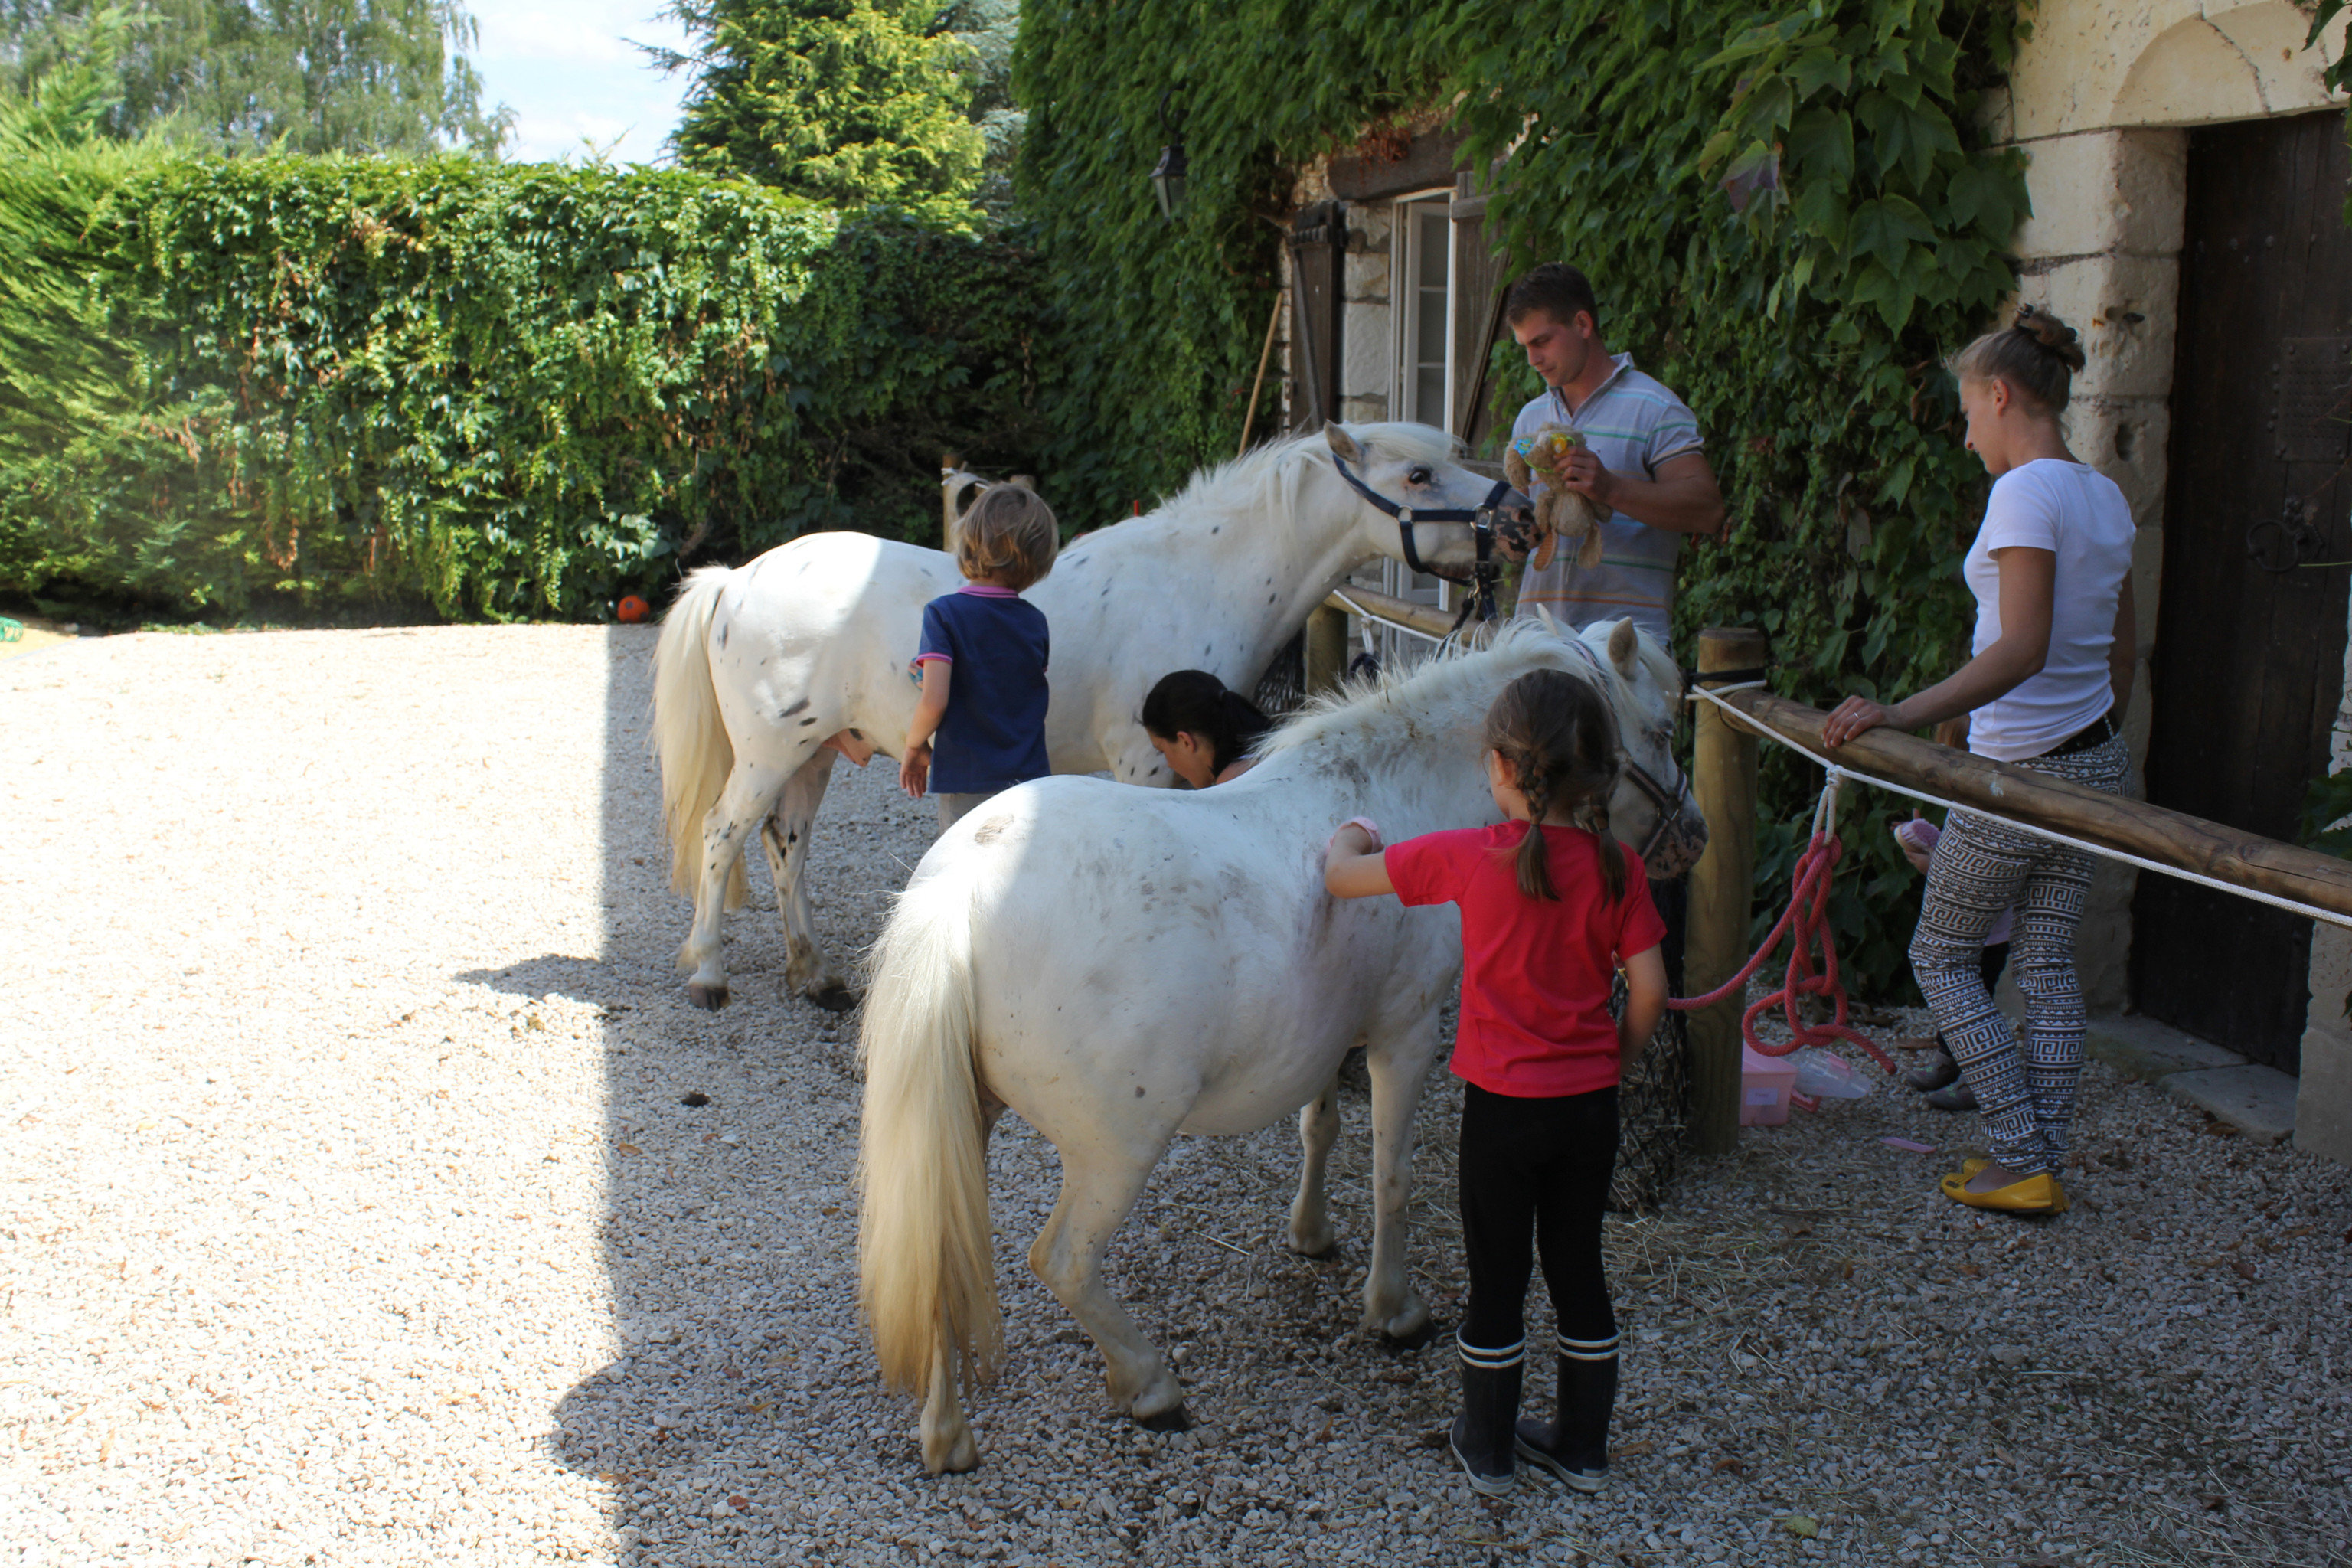 tree ground animal mammal horse standing Farm horse like mammal